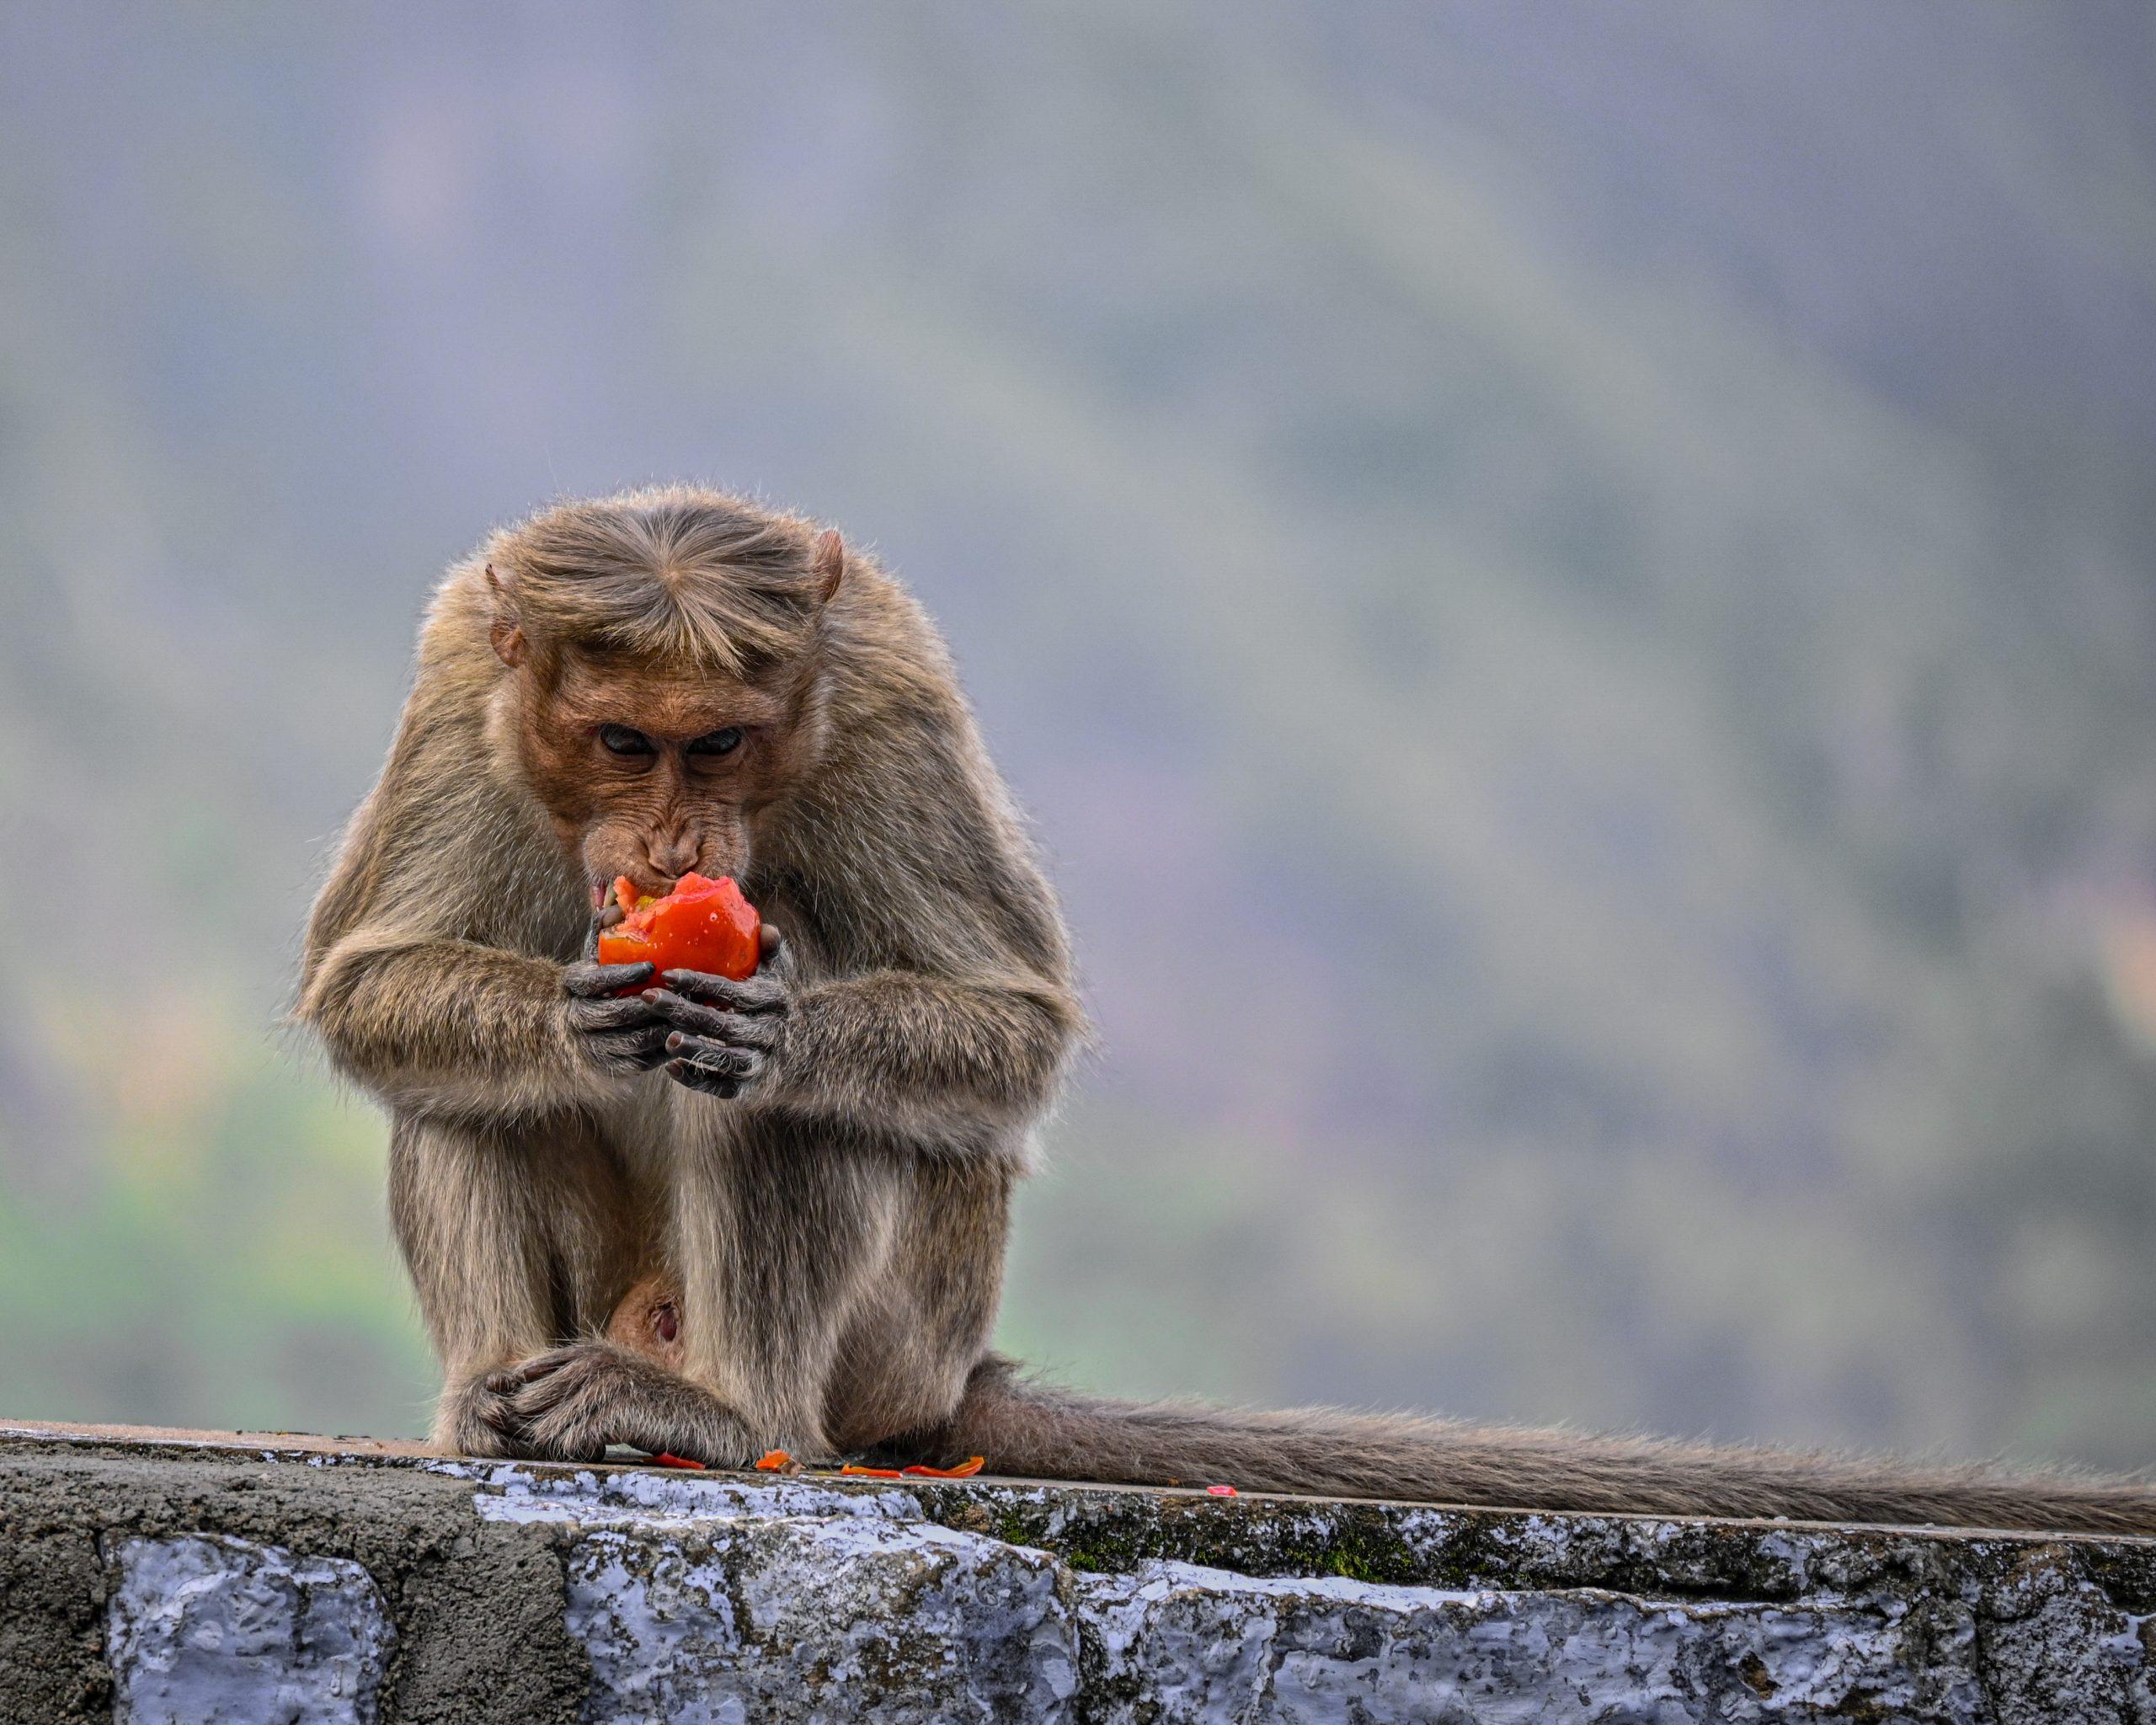 monkey eating tomato